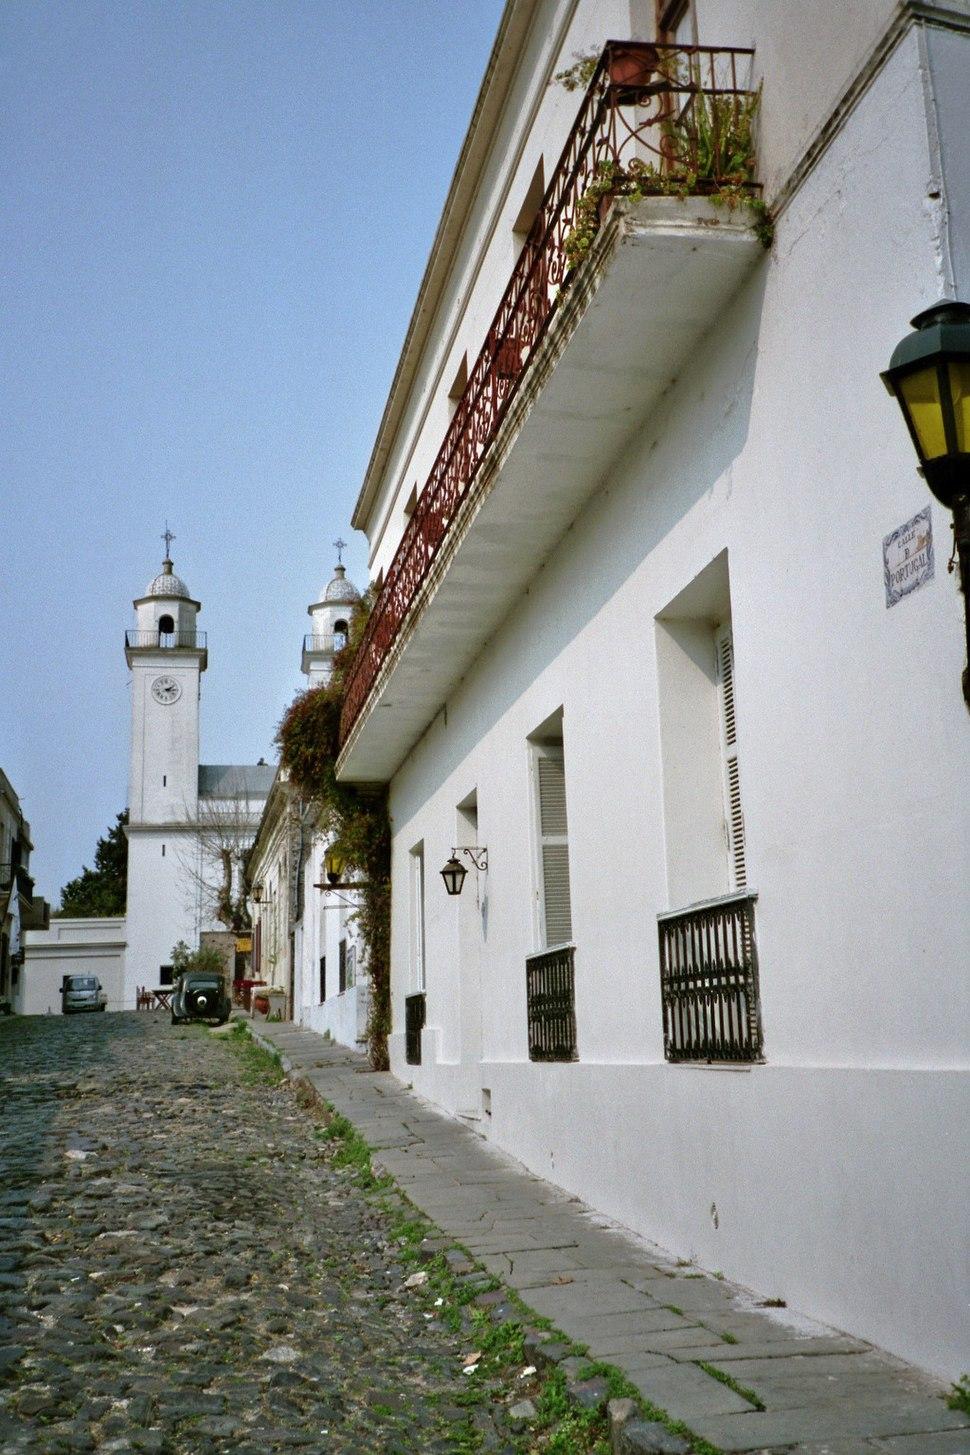 Colonia del Sacramento Uruguay 02